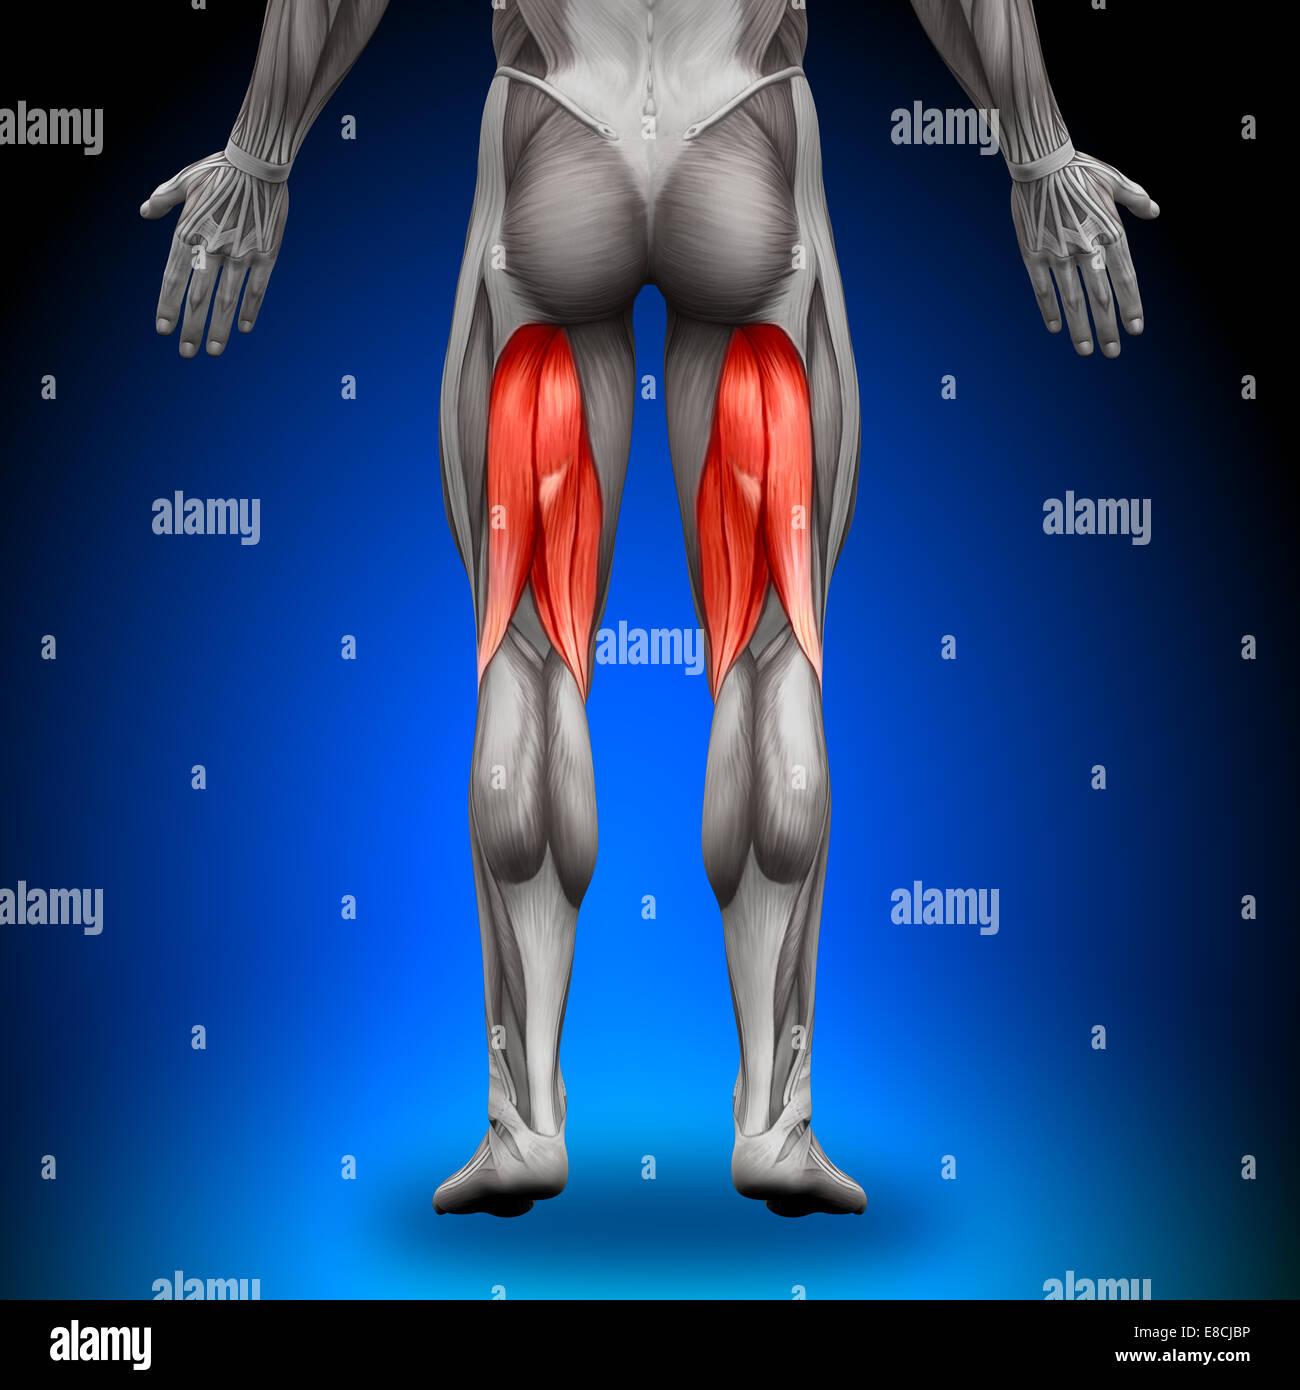 Hamstrings Male Muscles Anatomy Muscle Stock Photos & Hamstrings ...